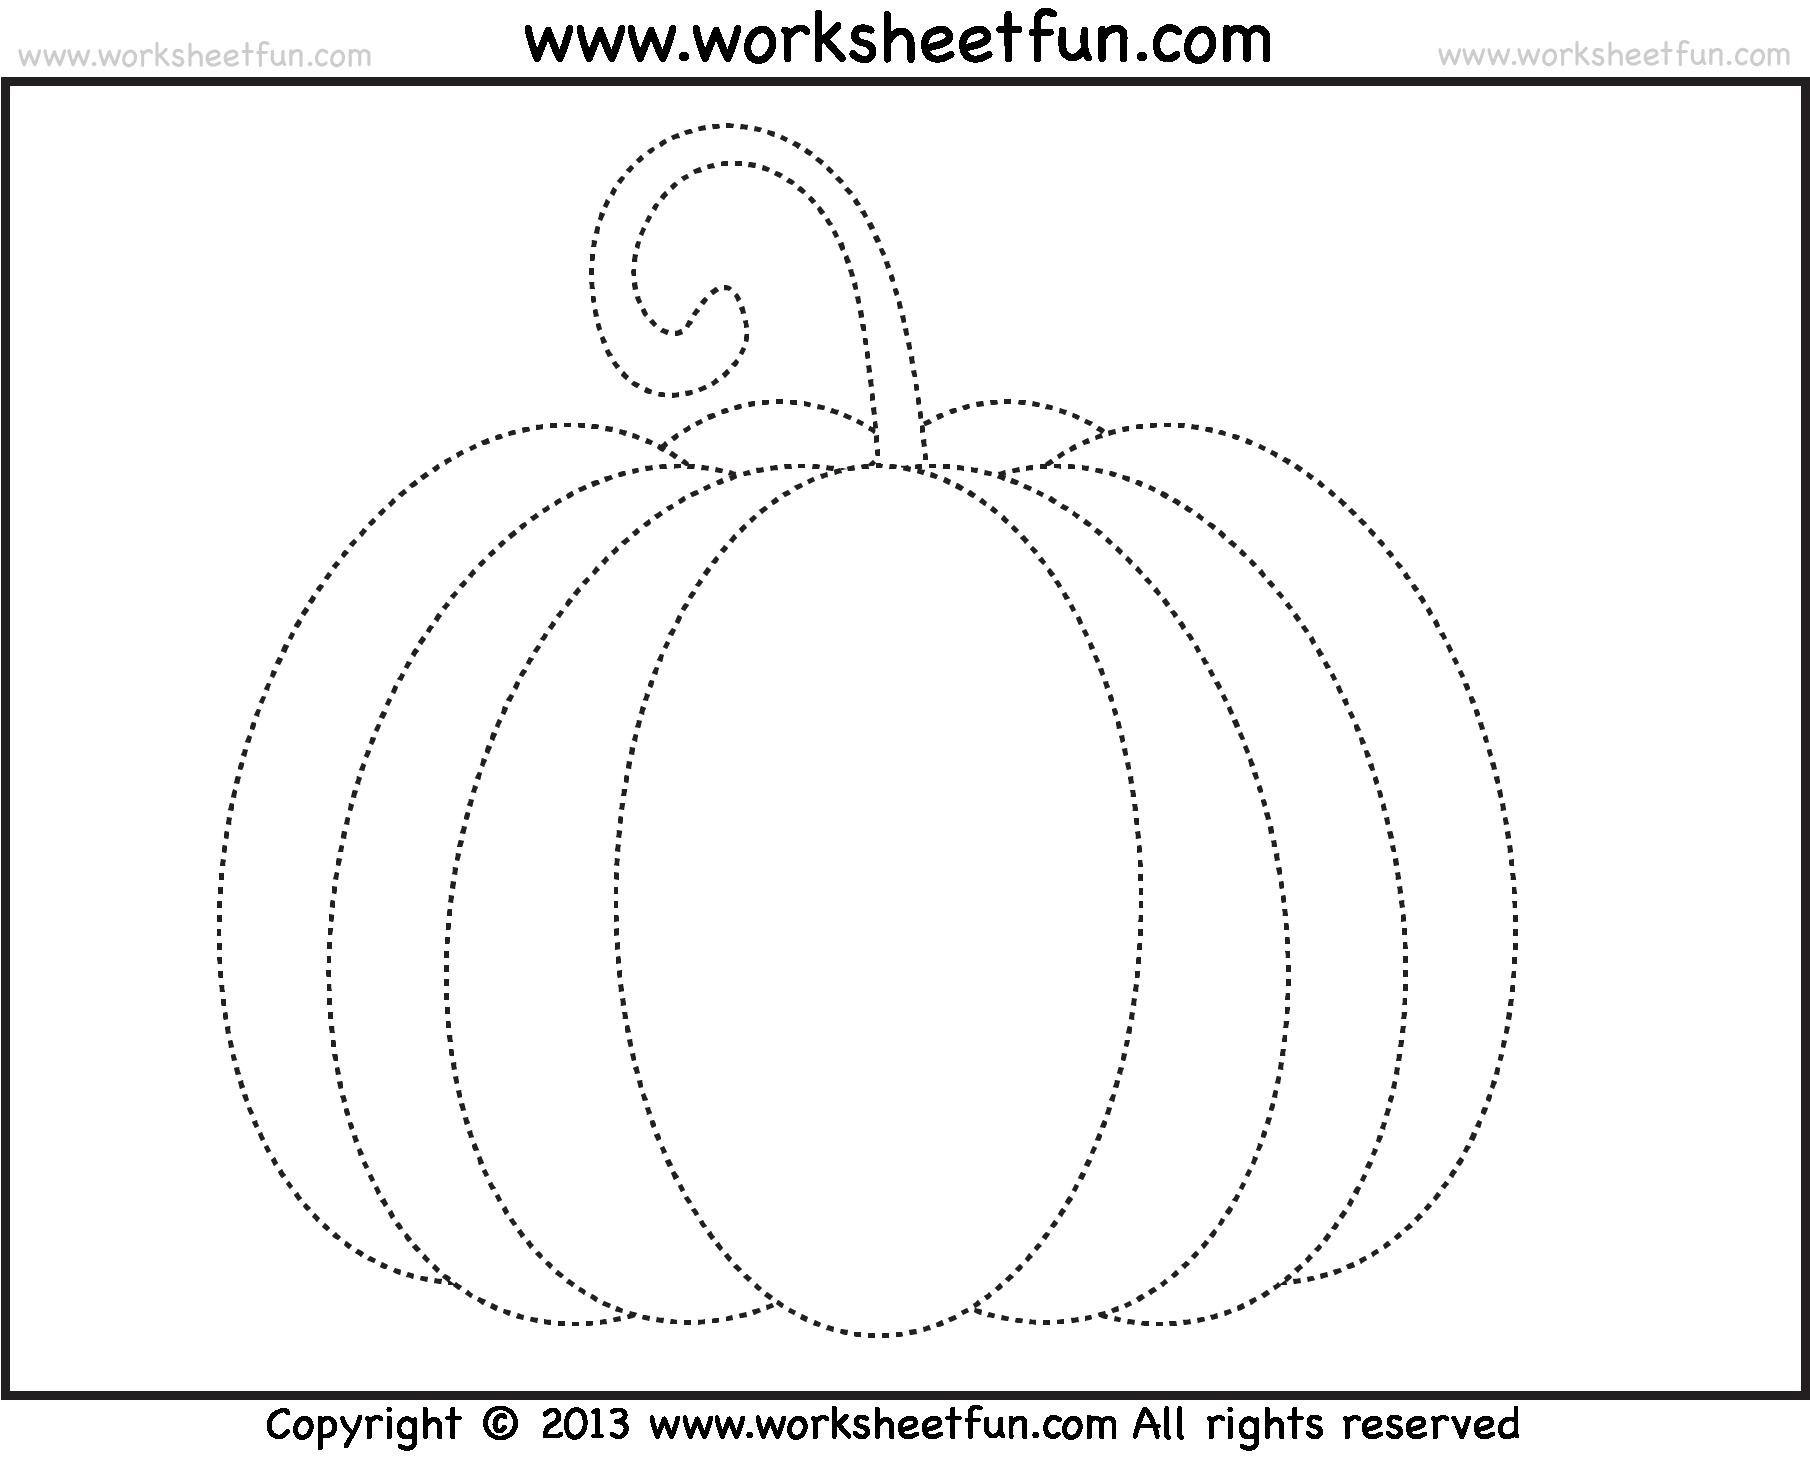 pumpkin tracing worksheet | Preschool Tracing | Pinterest | Tracing ...